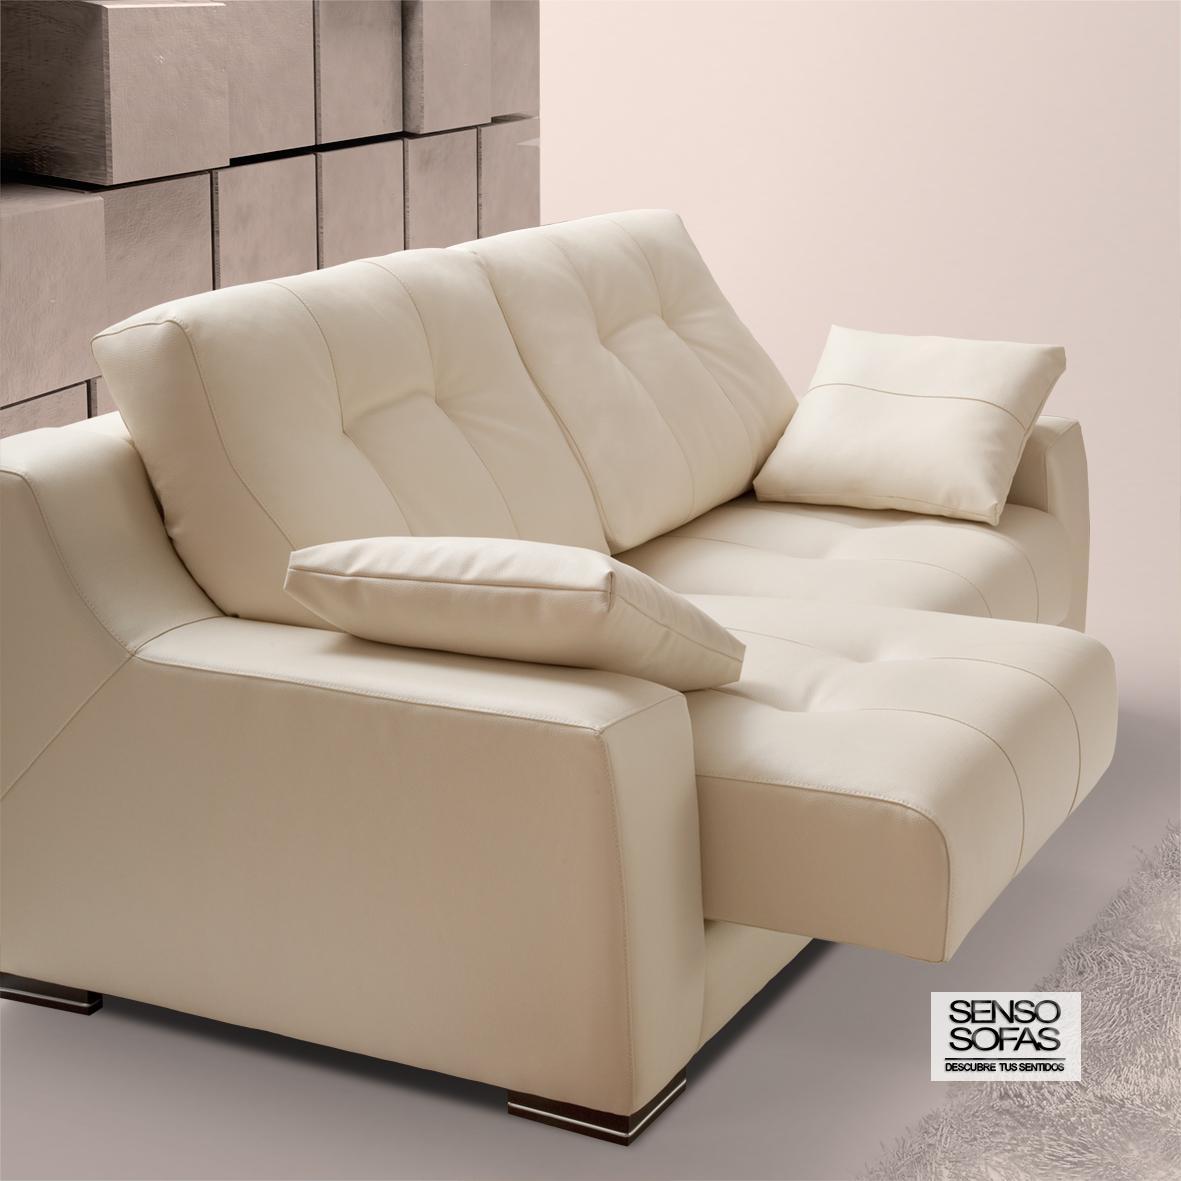 Sofa1 detalle 02 sensosofas for Sofas alicante liquidacion